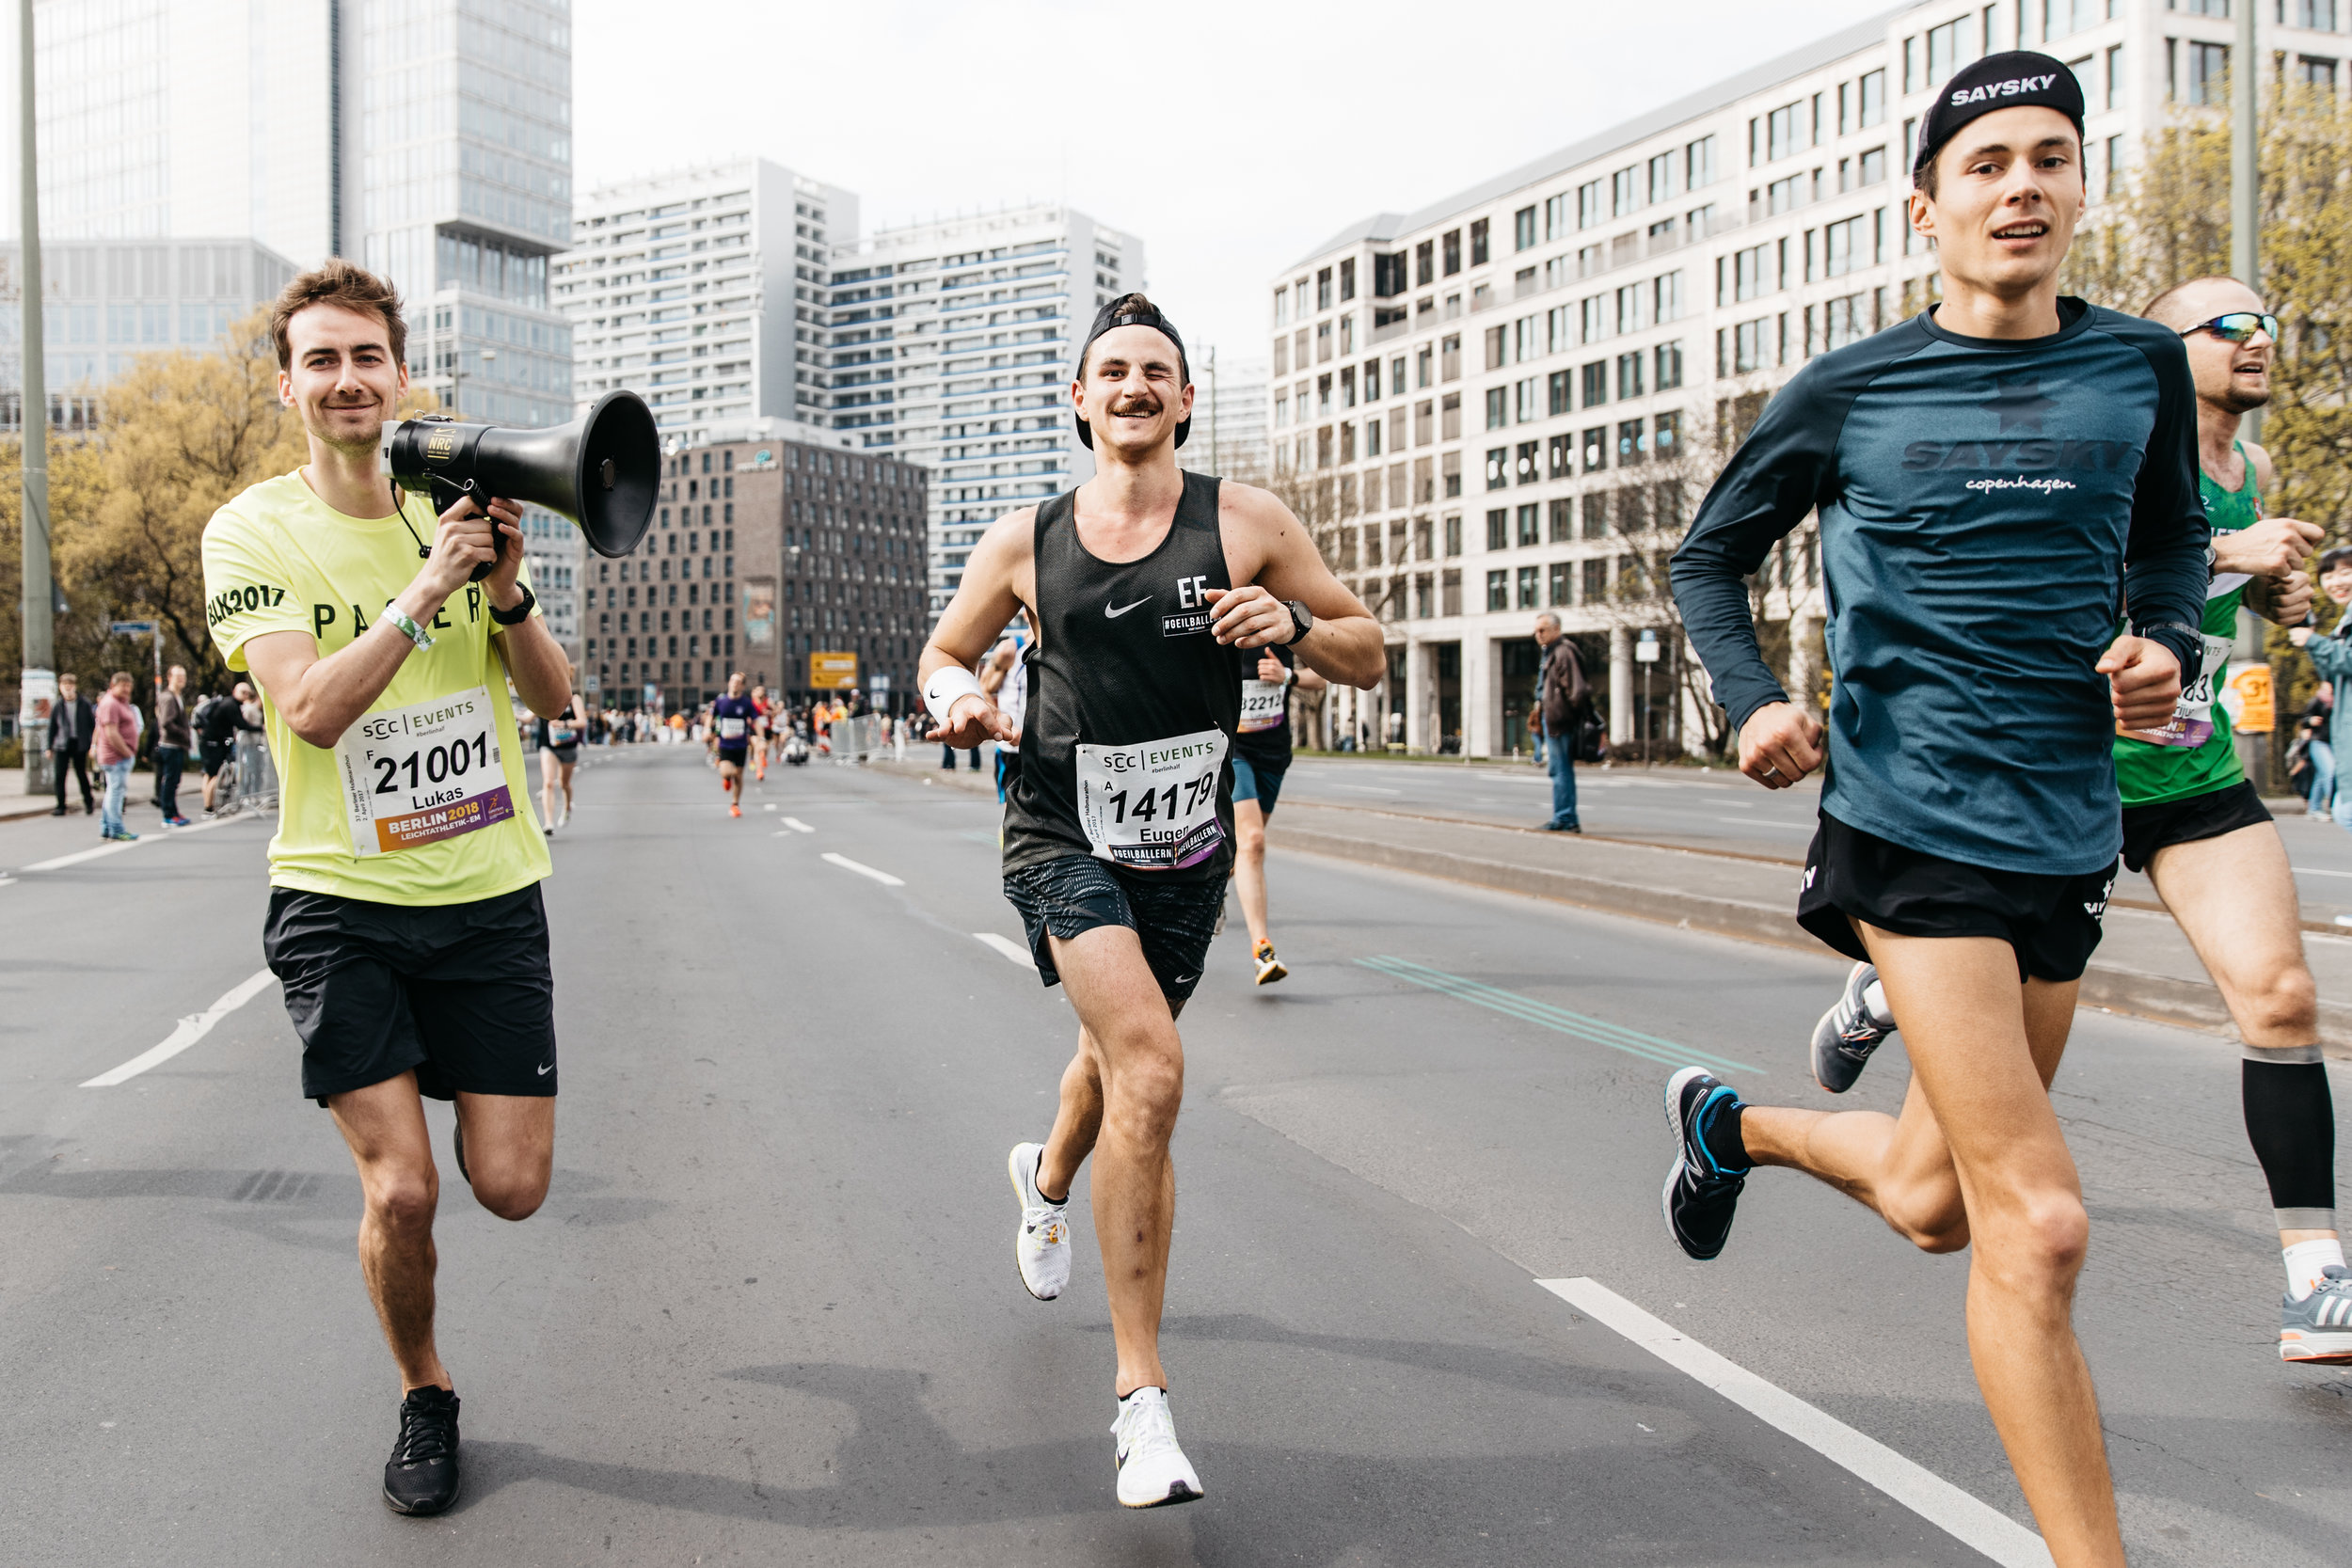 Eugen Fink, being paced by Philipp Baar